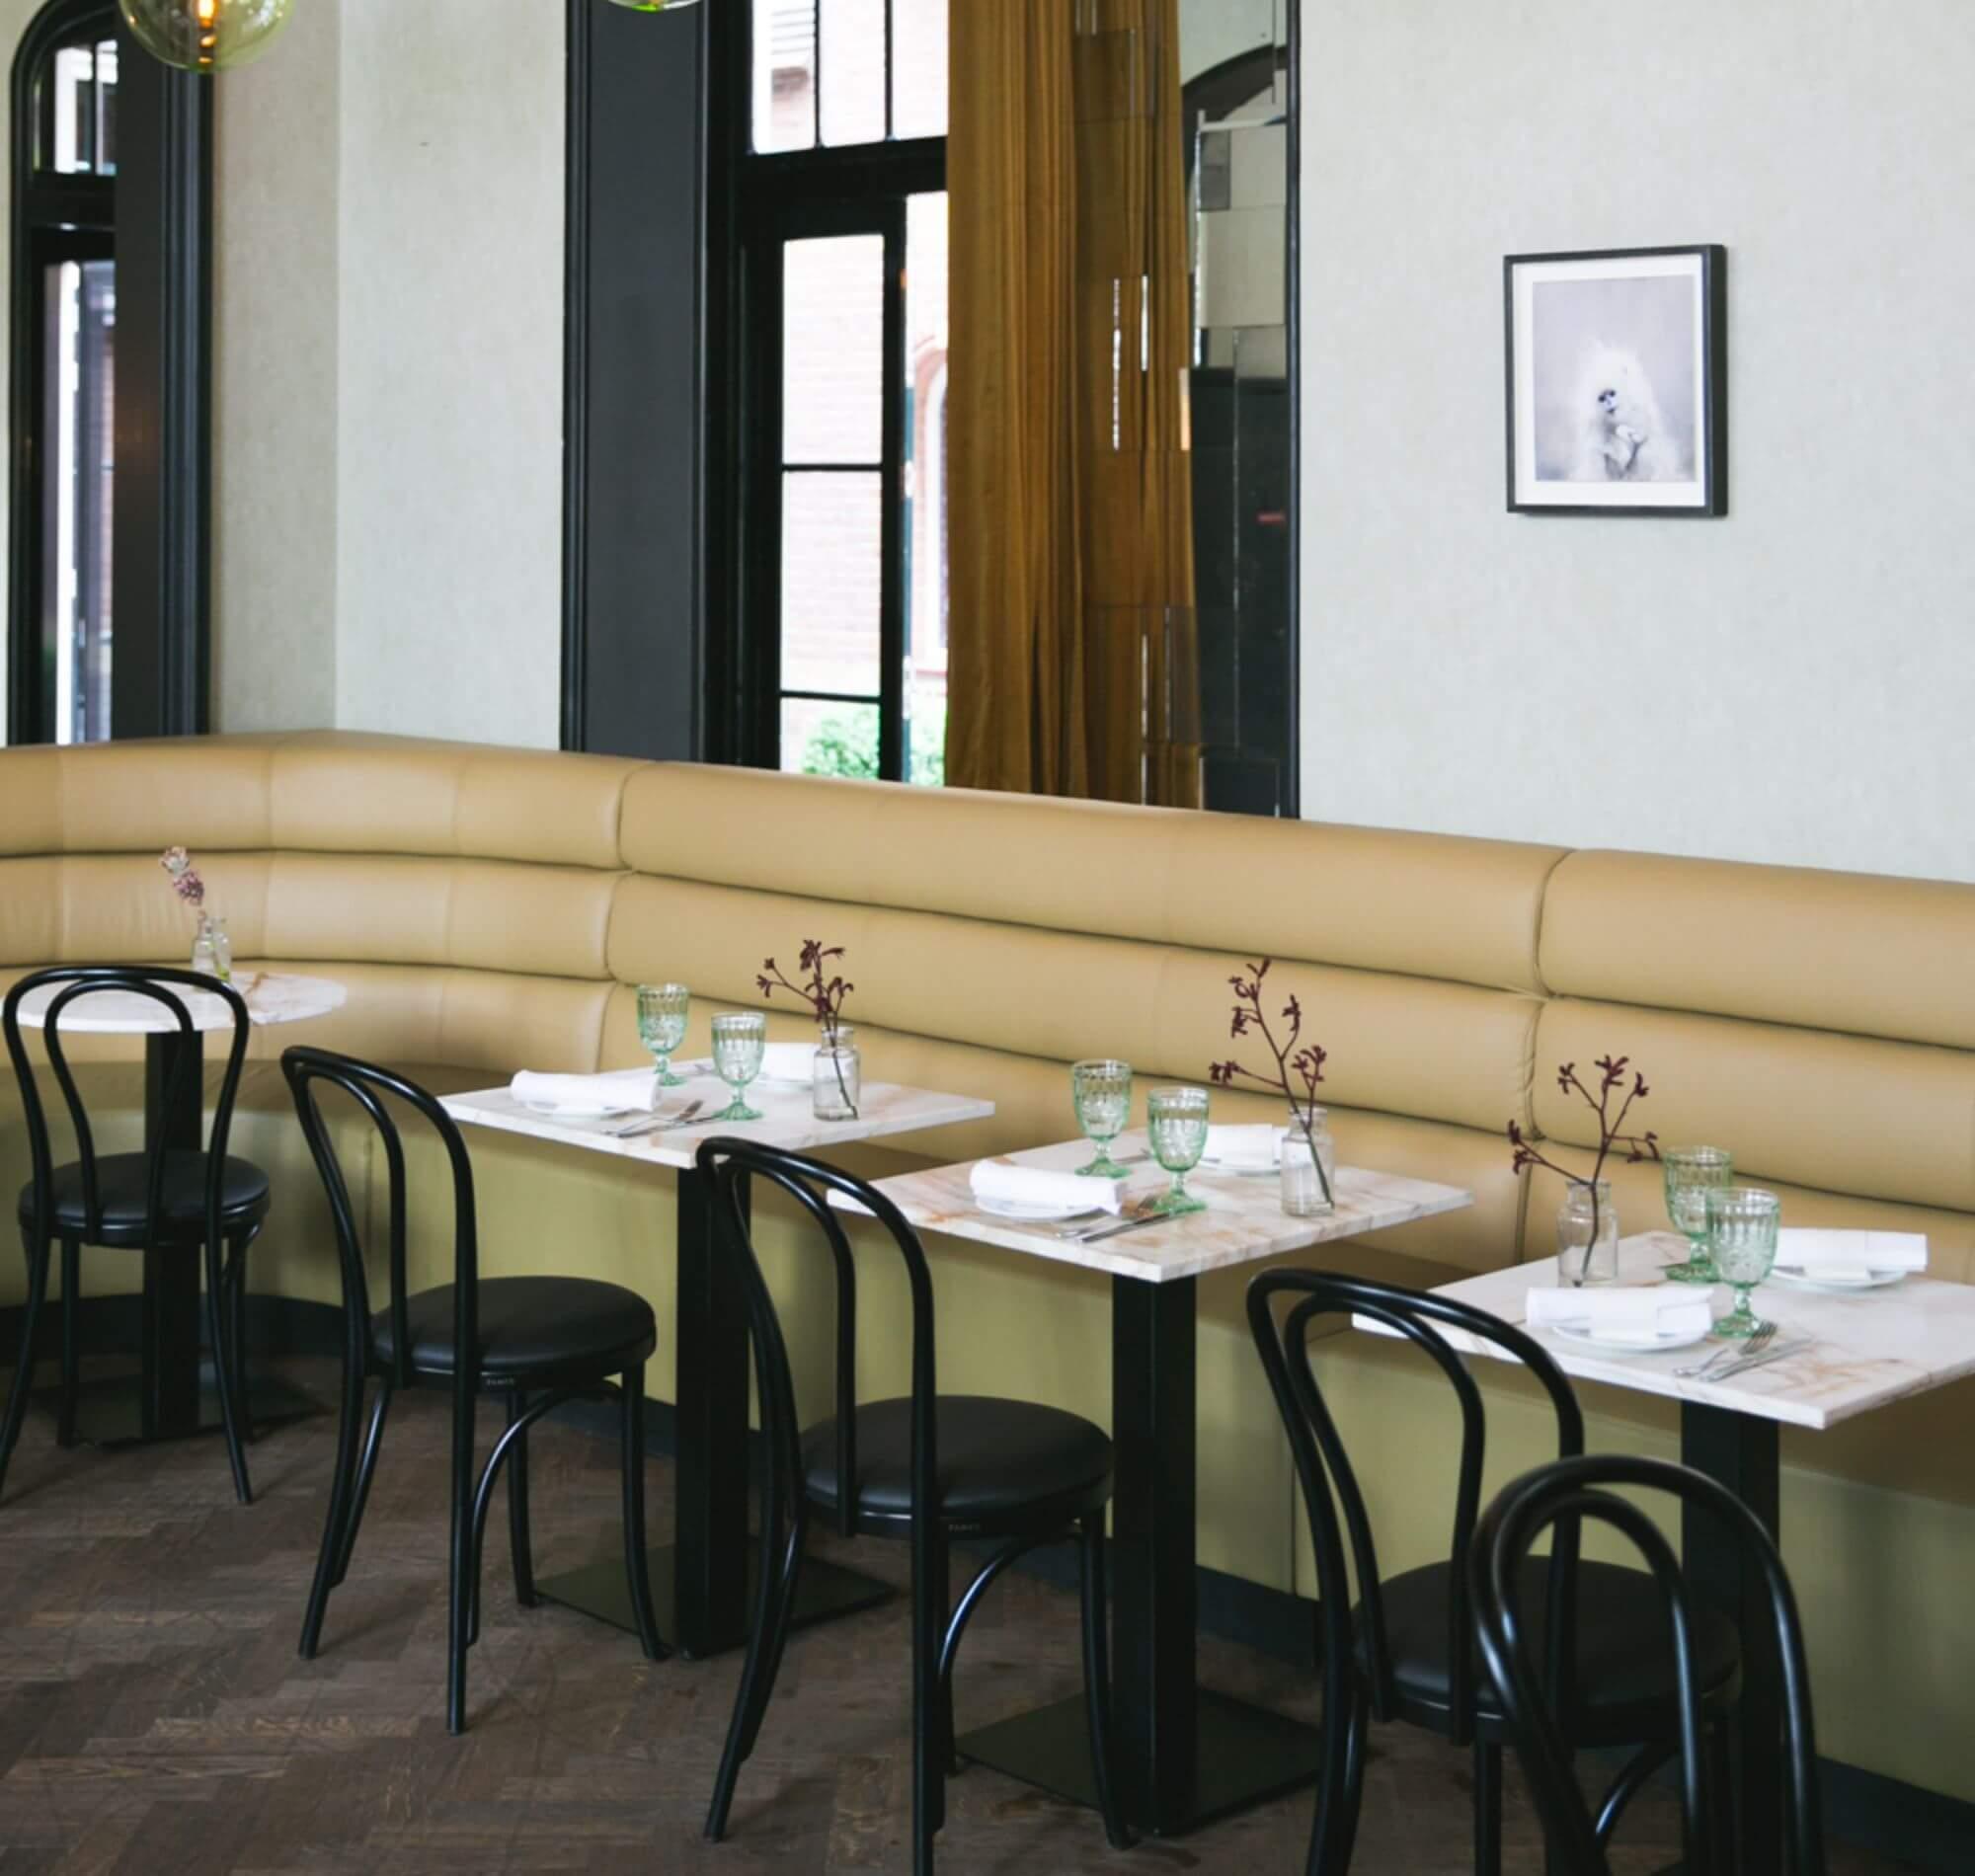 Ferilli's (restaurant The College Hotel)1